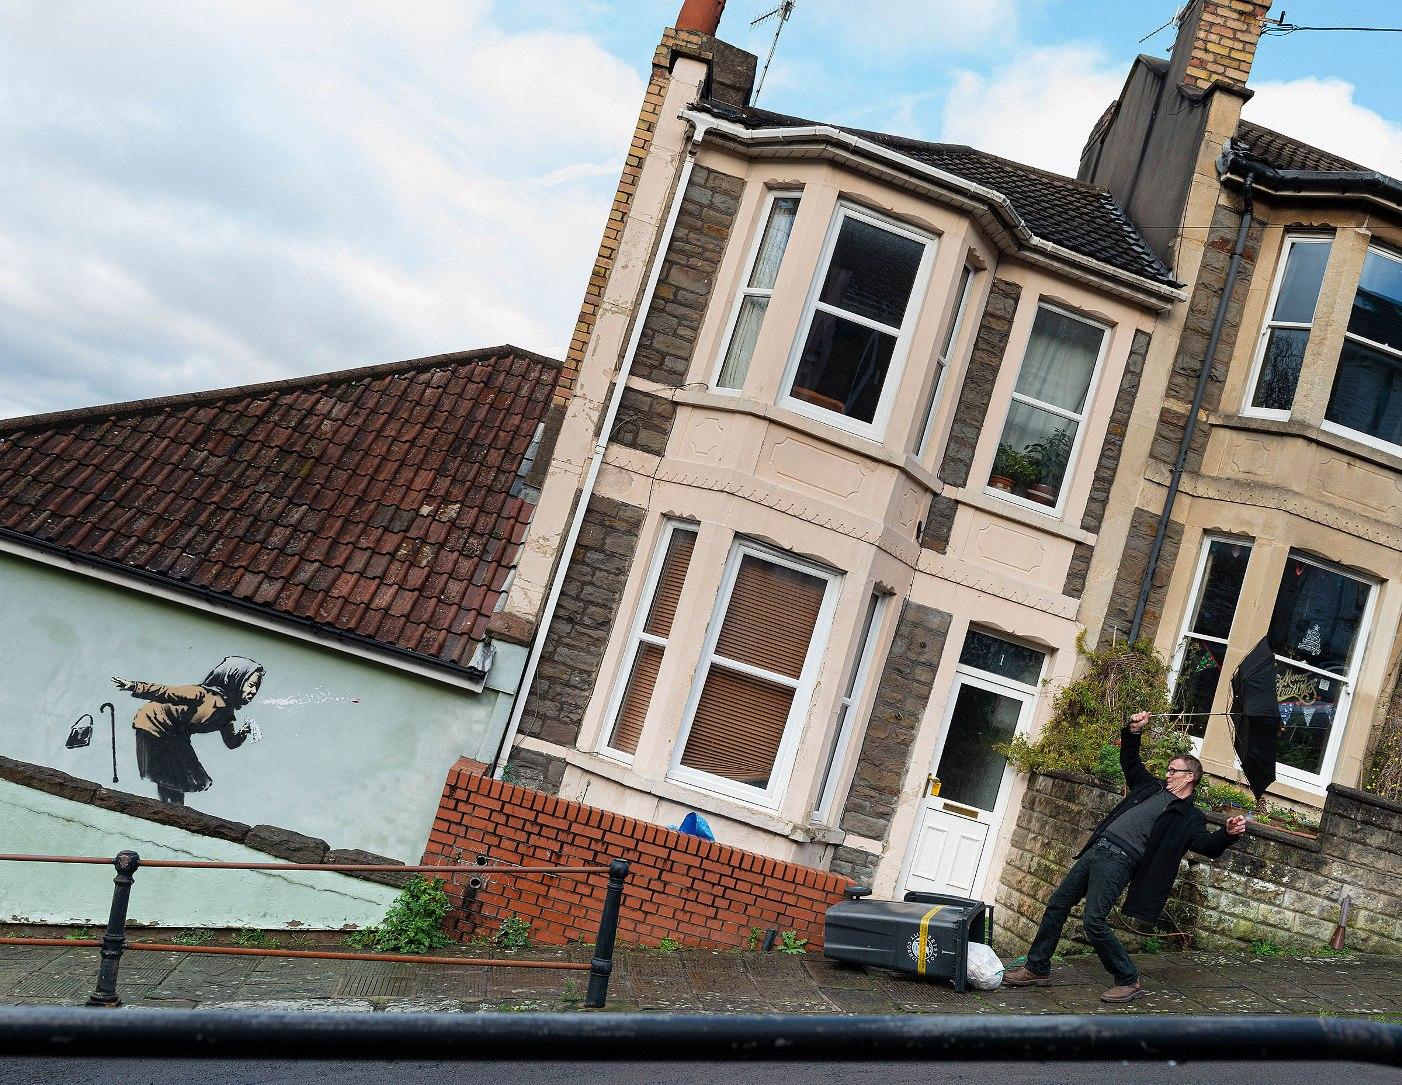 """Aachoo!!"" in Bristol: The Anonymous Artist Banksy Rises Again"